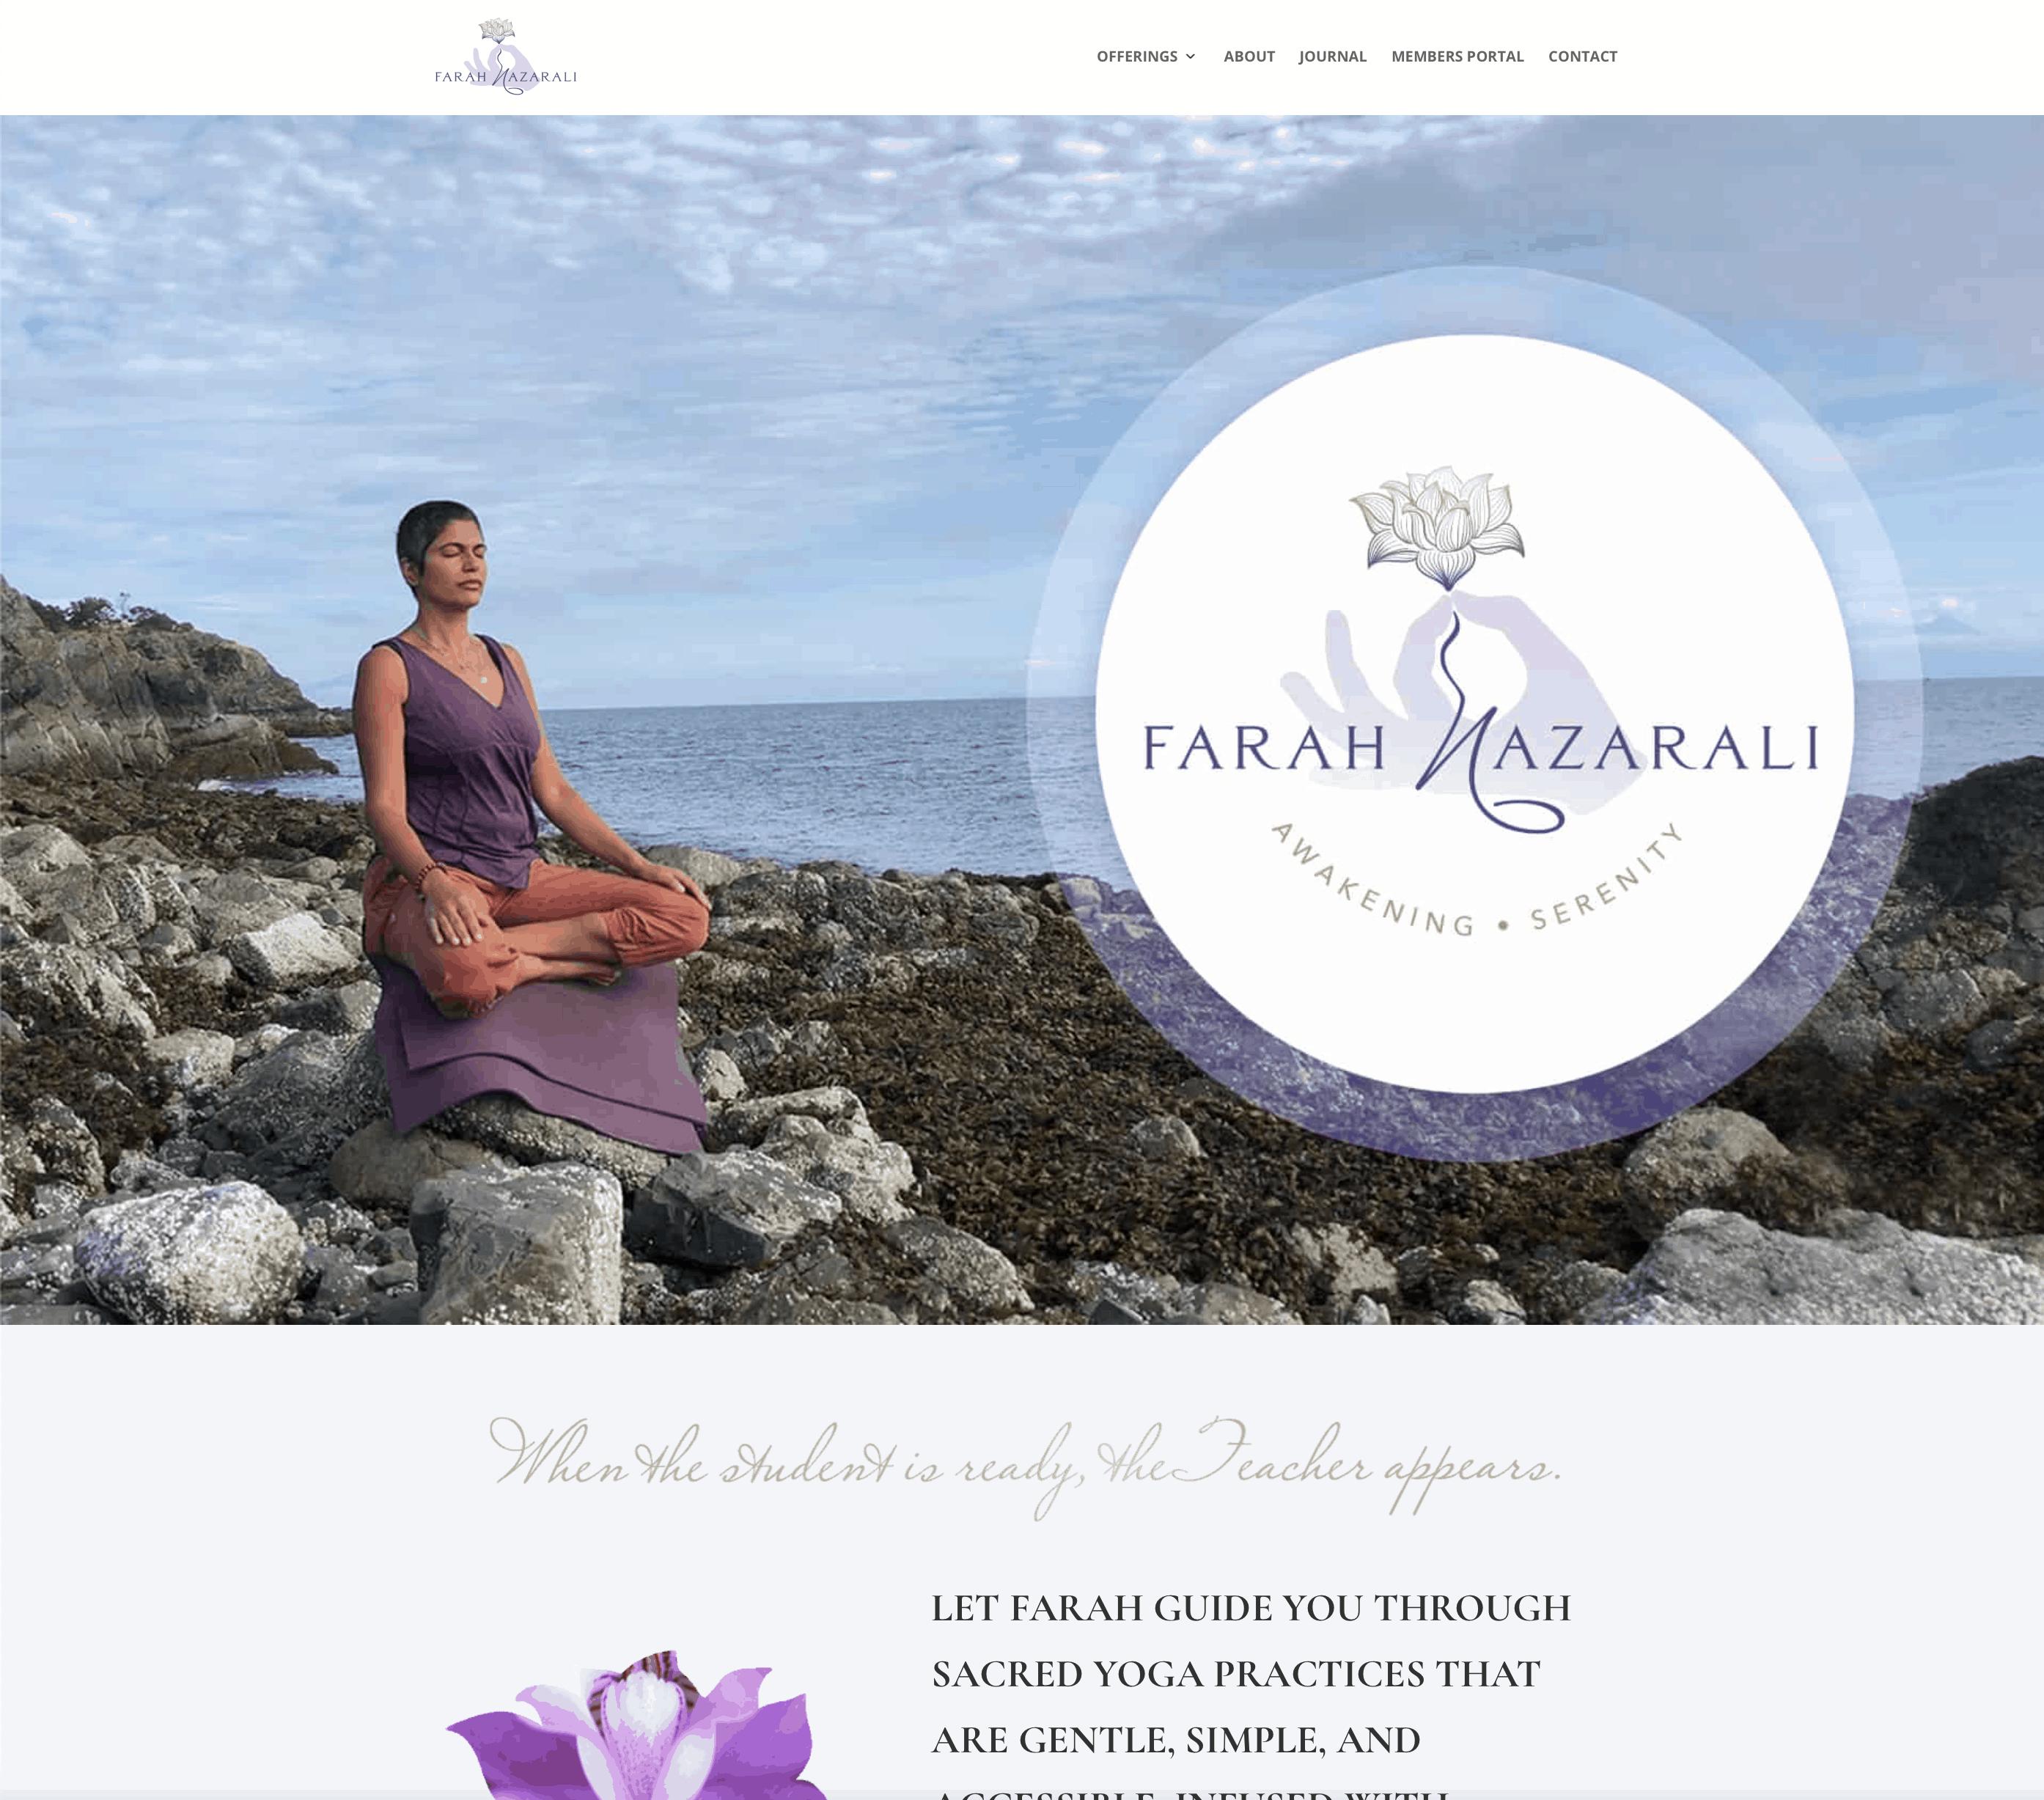 Farah Nazarali homepage